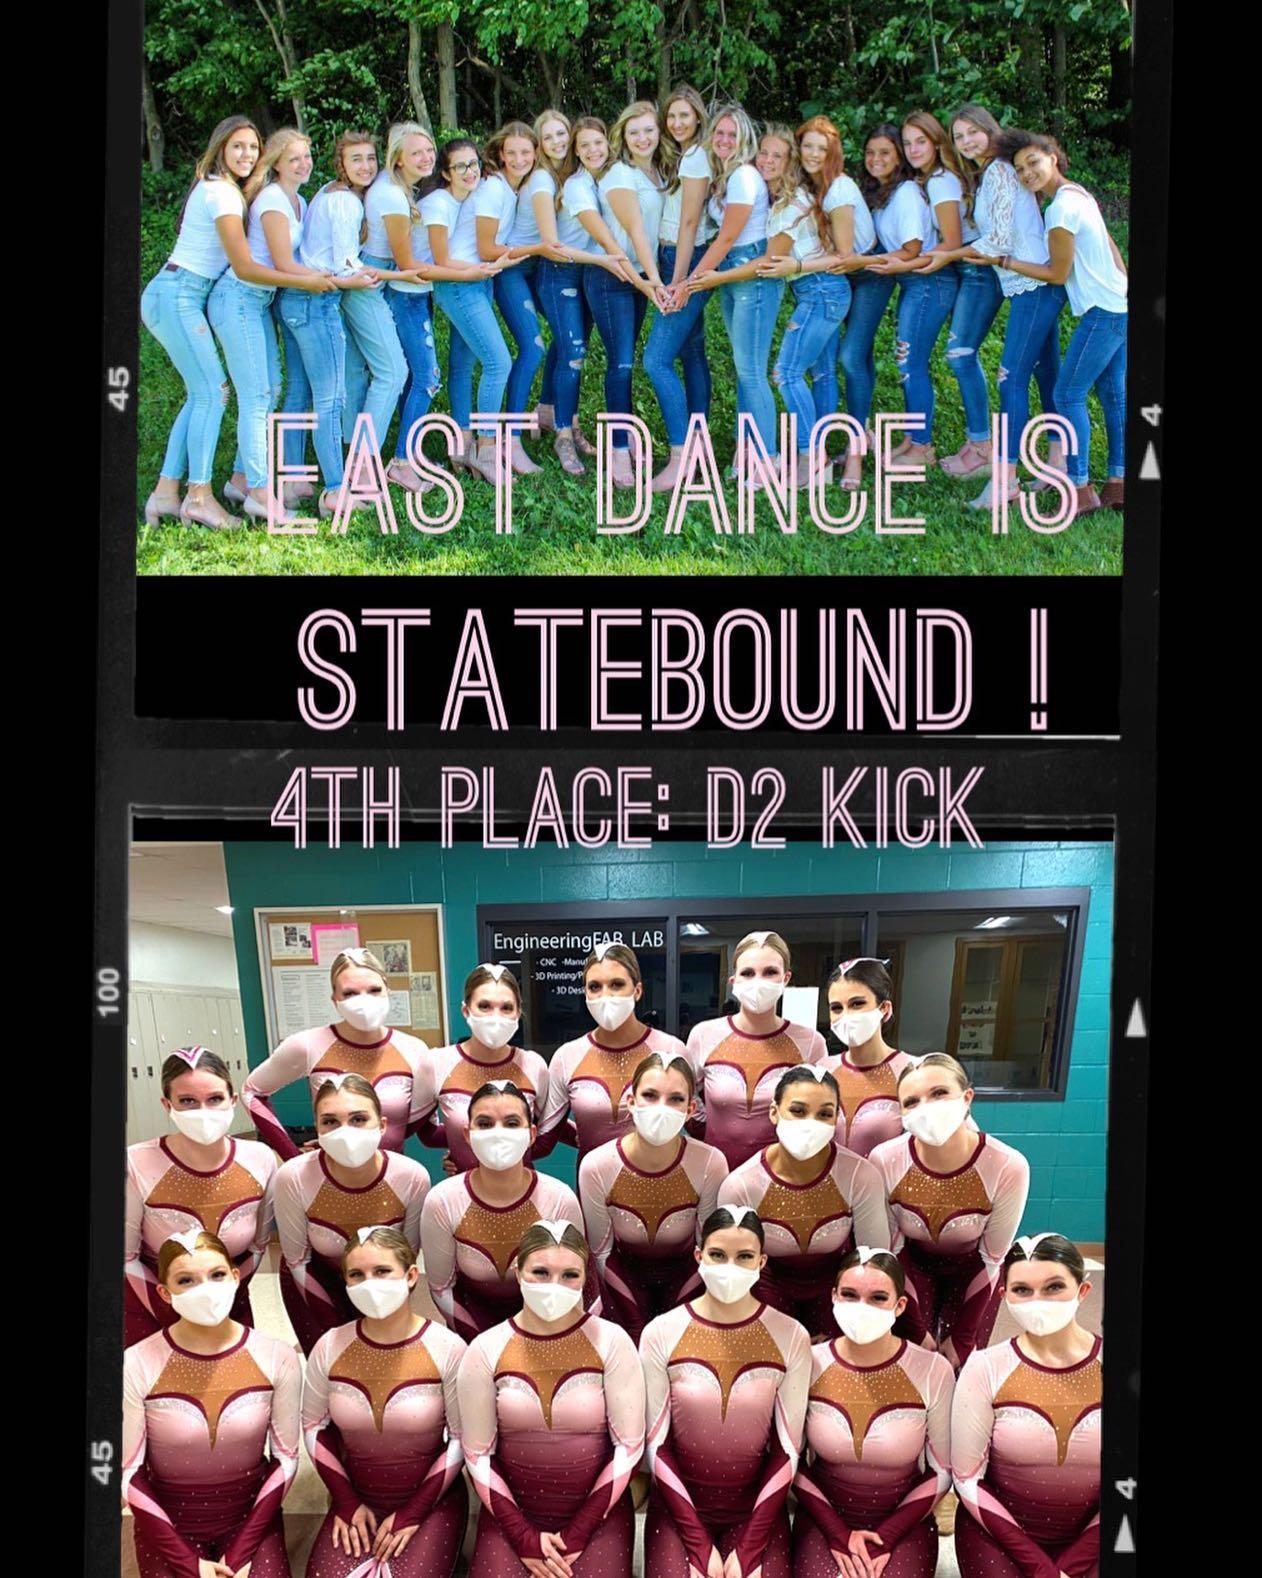 East Dance is Statebound!